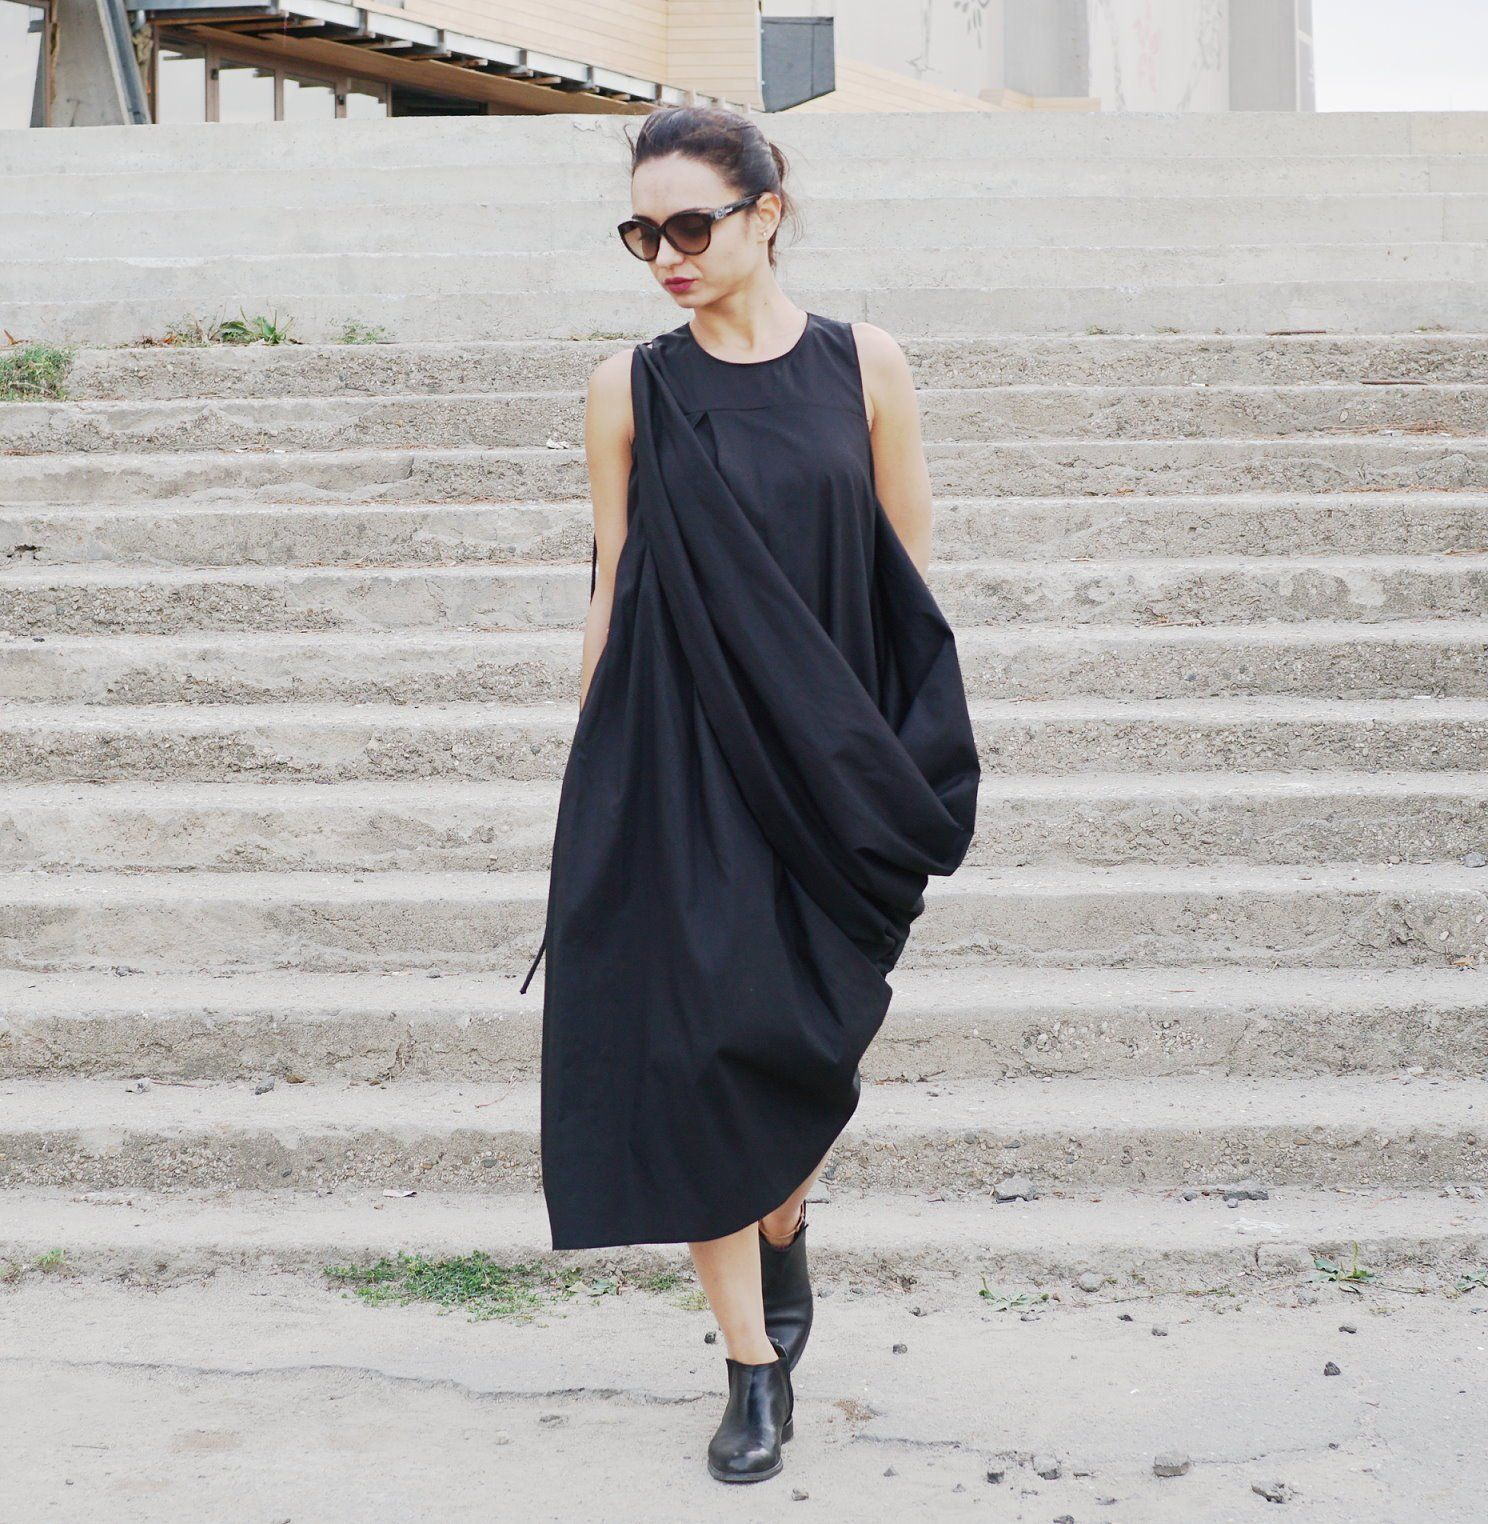 Black maxi dress sleeveless party kaftan stylish oversized dress